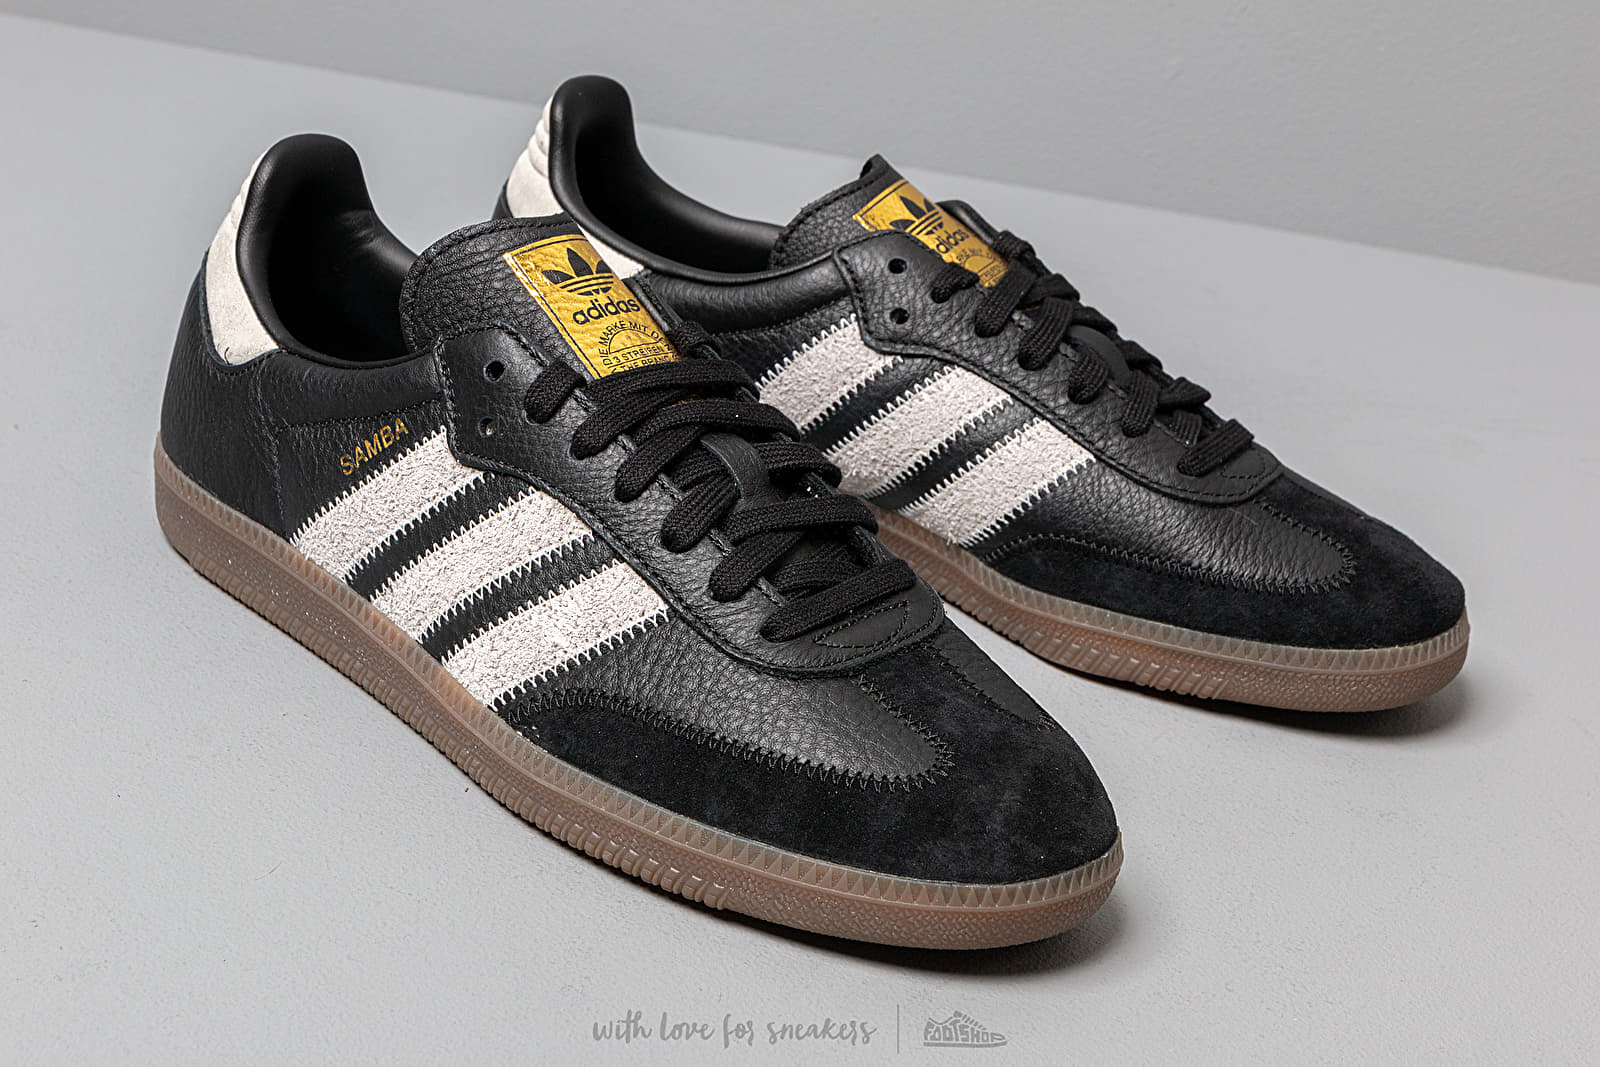 Tengo una clase de ingles prisa Luminancia  Men's shoes adidas Samba OG Ft Core Black/ Raw White/ Gold Metalic